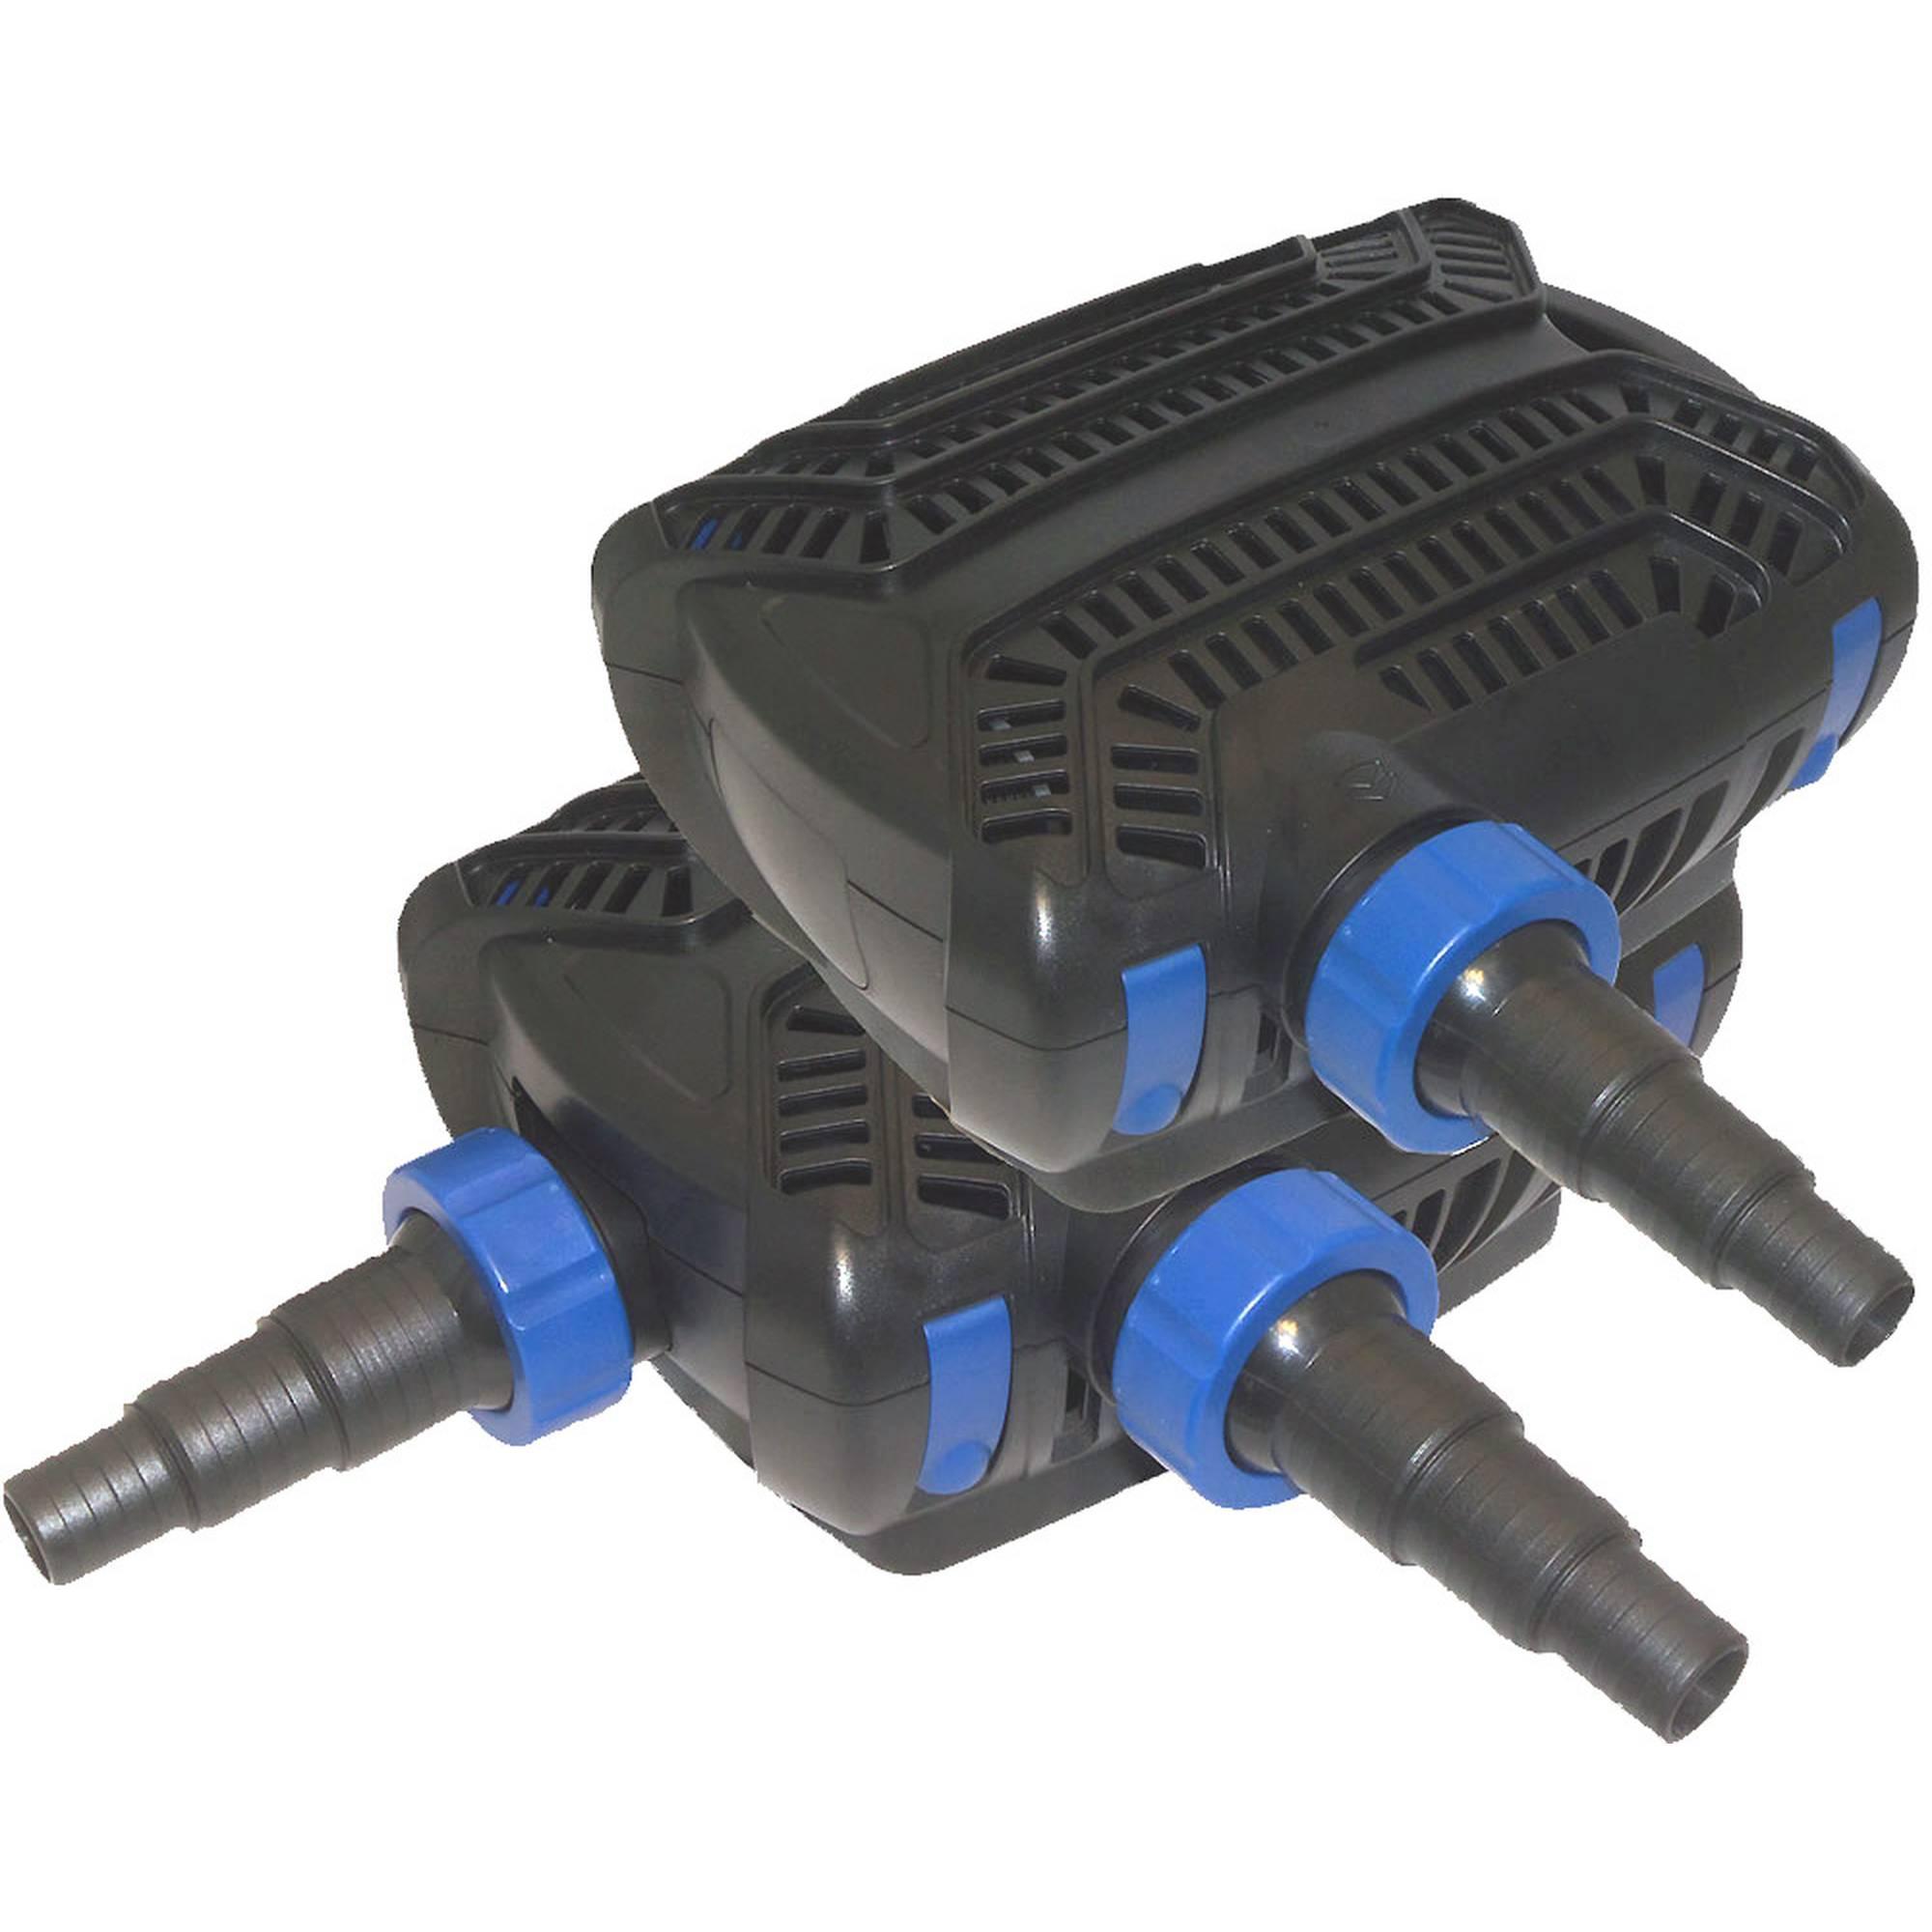 AKWADO 10000 l/h 80W Filterpumpe, Bachlaufpumpe, Teichpumpe